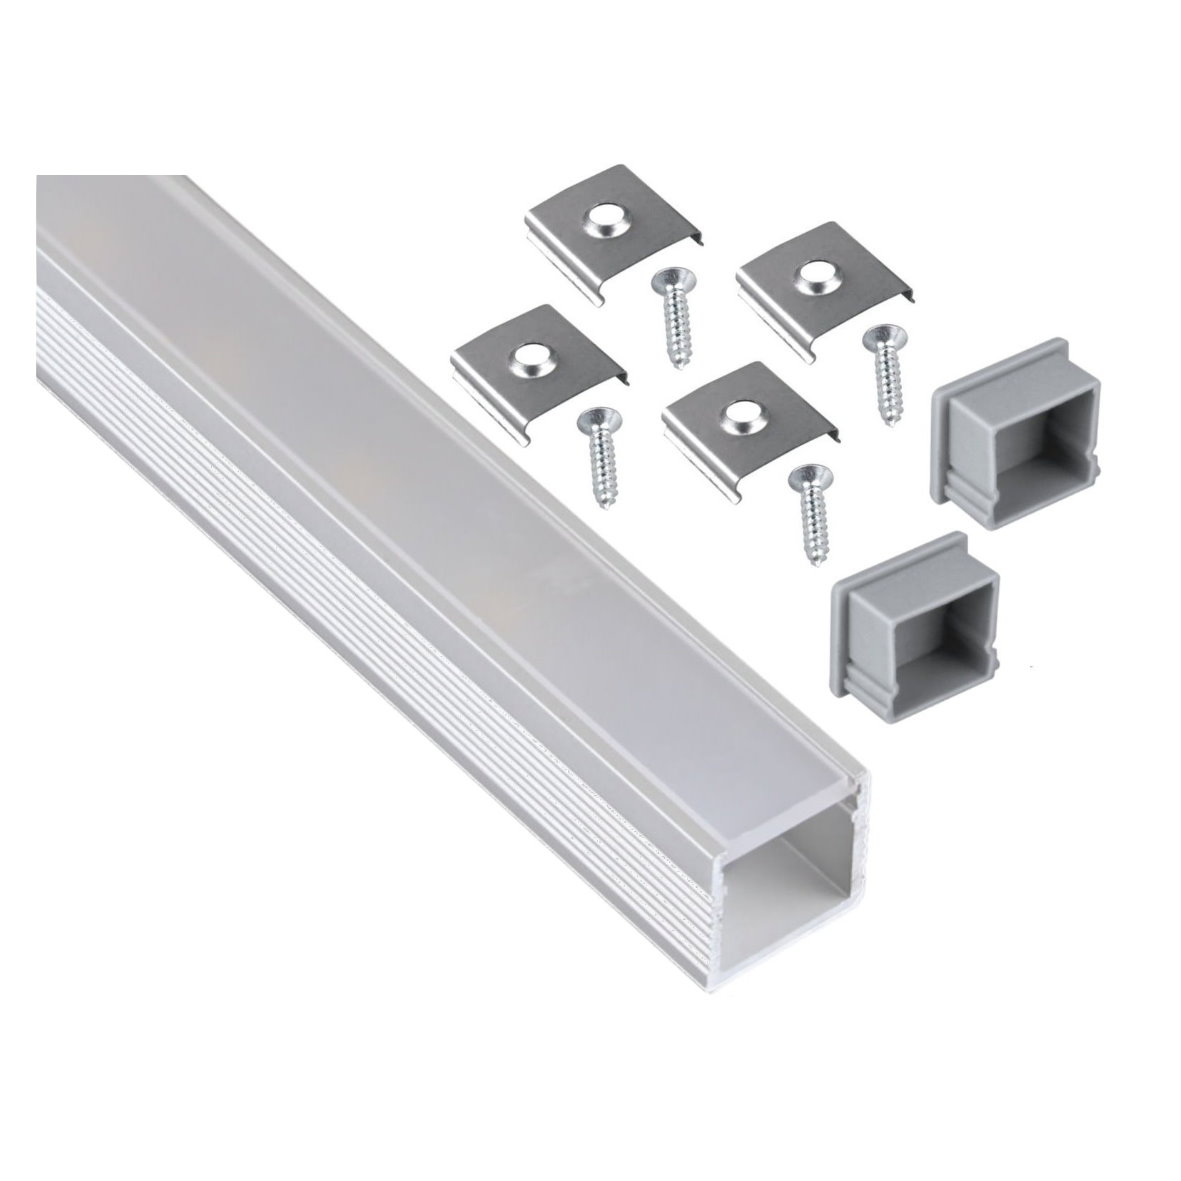 aluminium aufbau alu profil 2m abdeckung opal endkappe. Black Bedroom Furniture Sets. Home Design Ideas